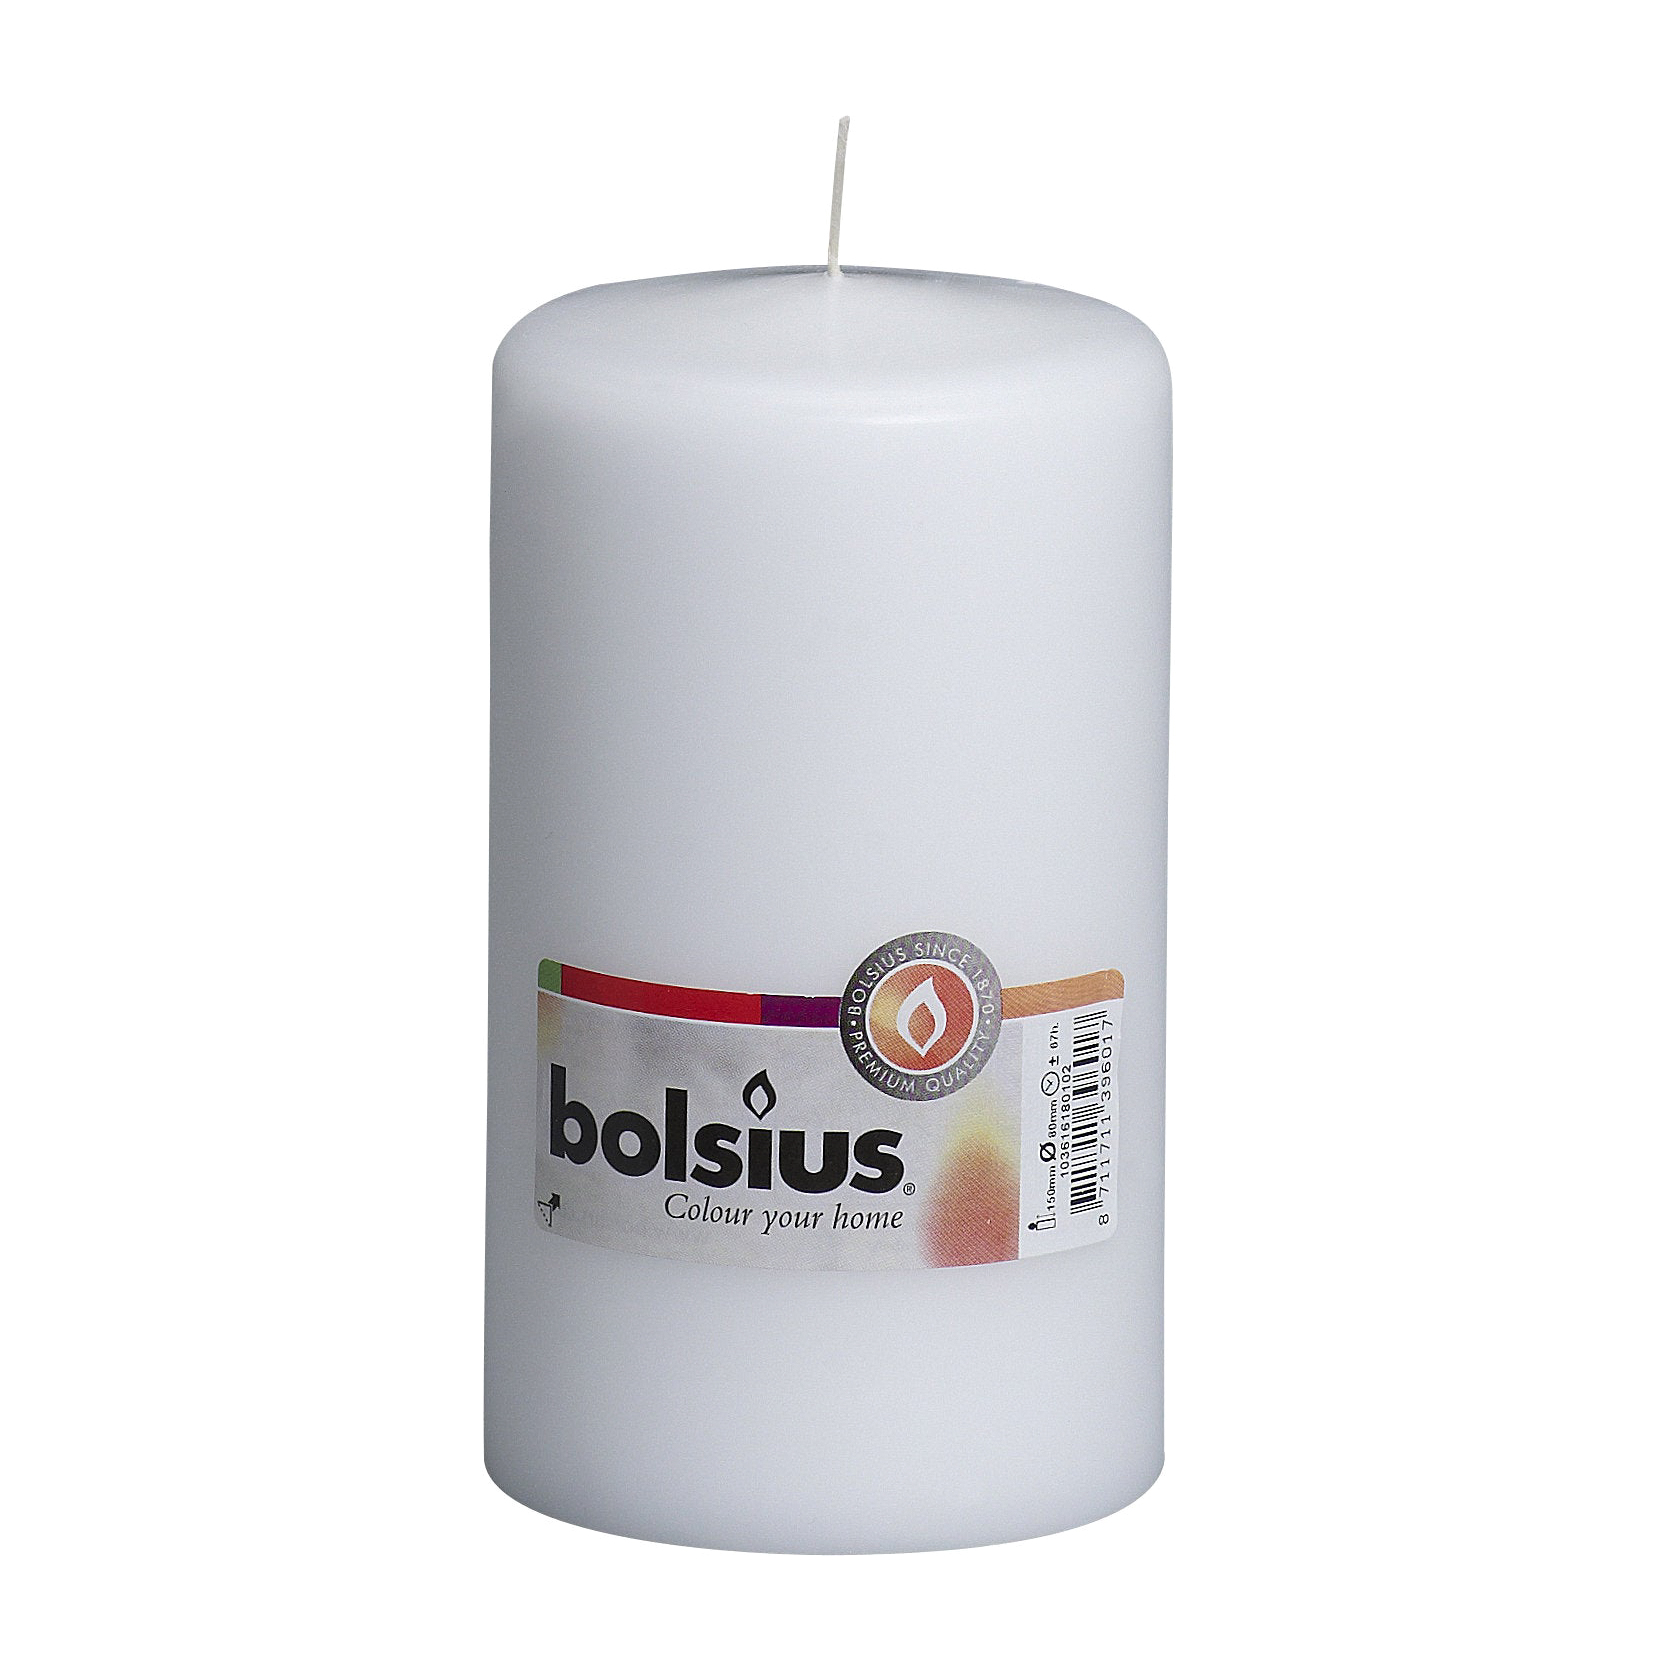 Фото - Свеча-столбик Bolsius 15x8 белая свеча столбик bolsius 12x6 коричневая